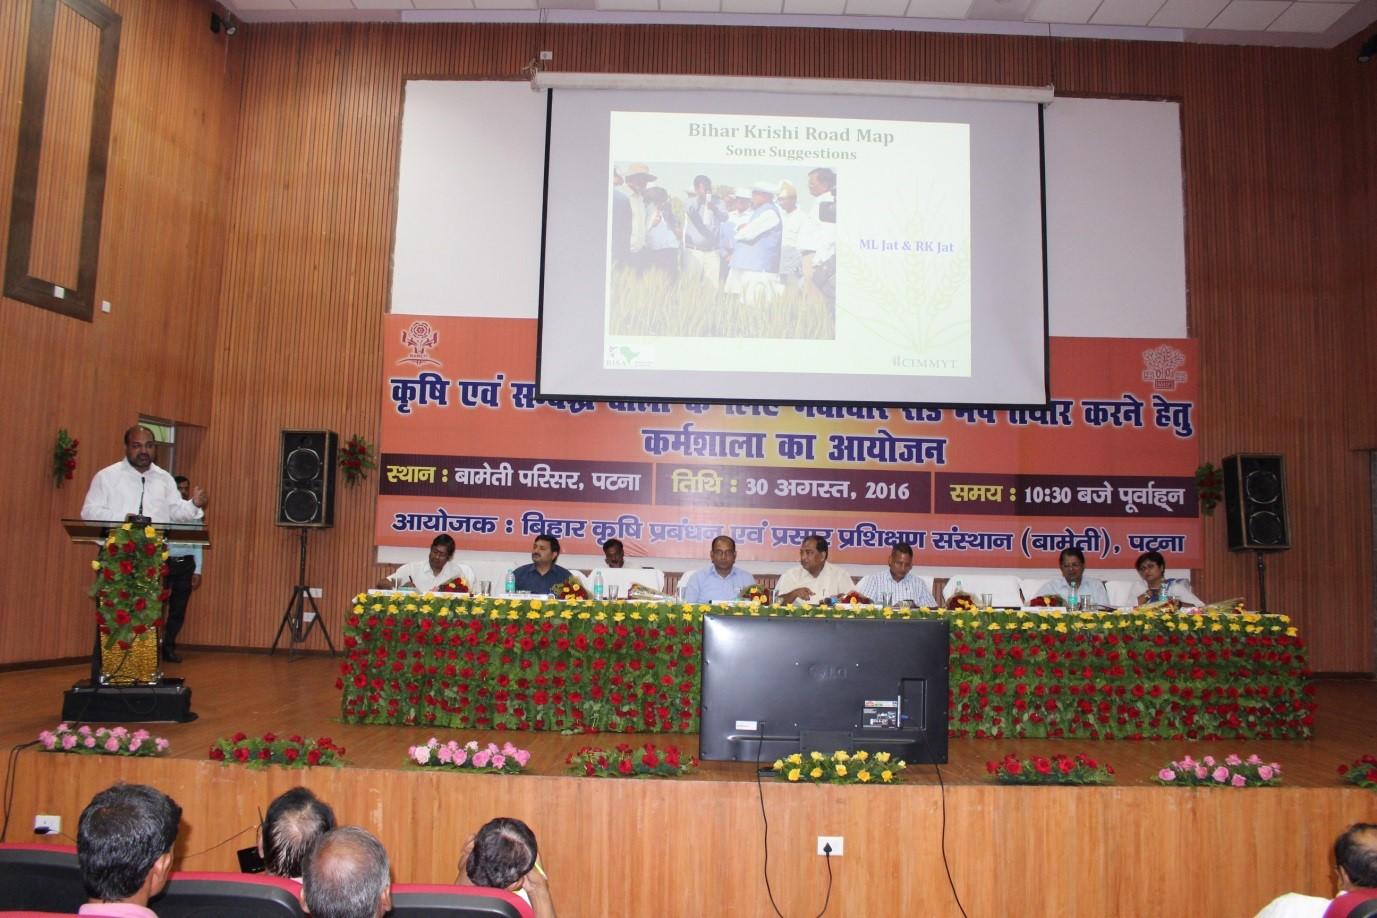 Introducing climate change in Bihar's Krishi road map. Photo: CIMMYT-BISA